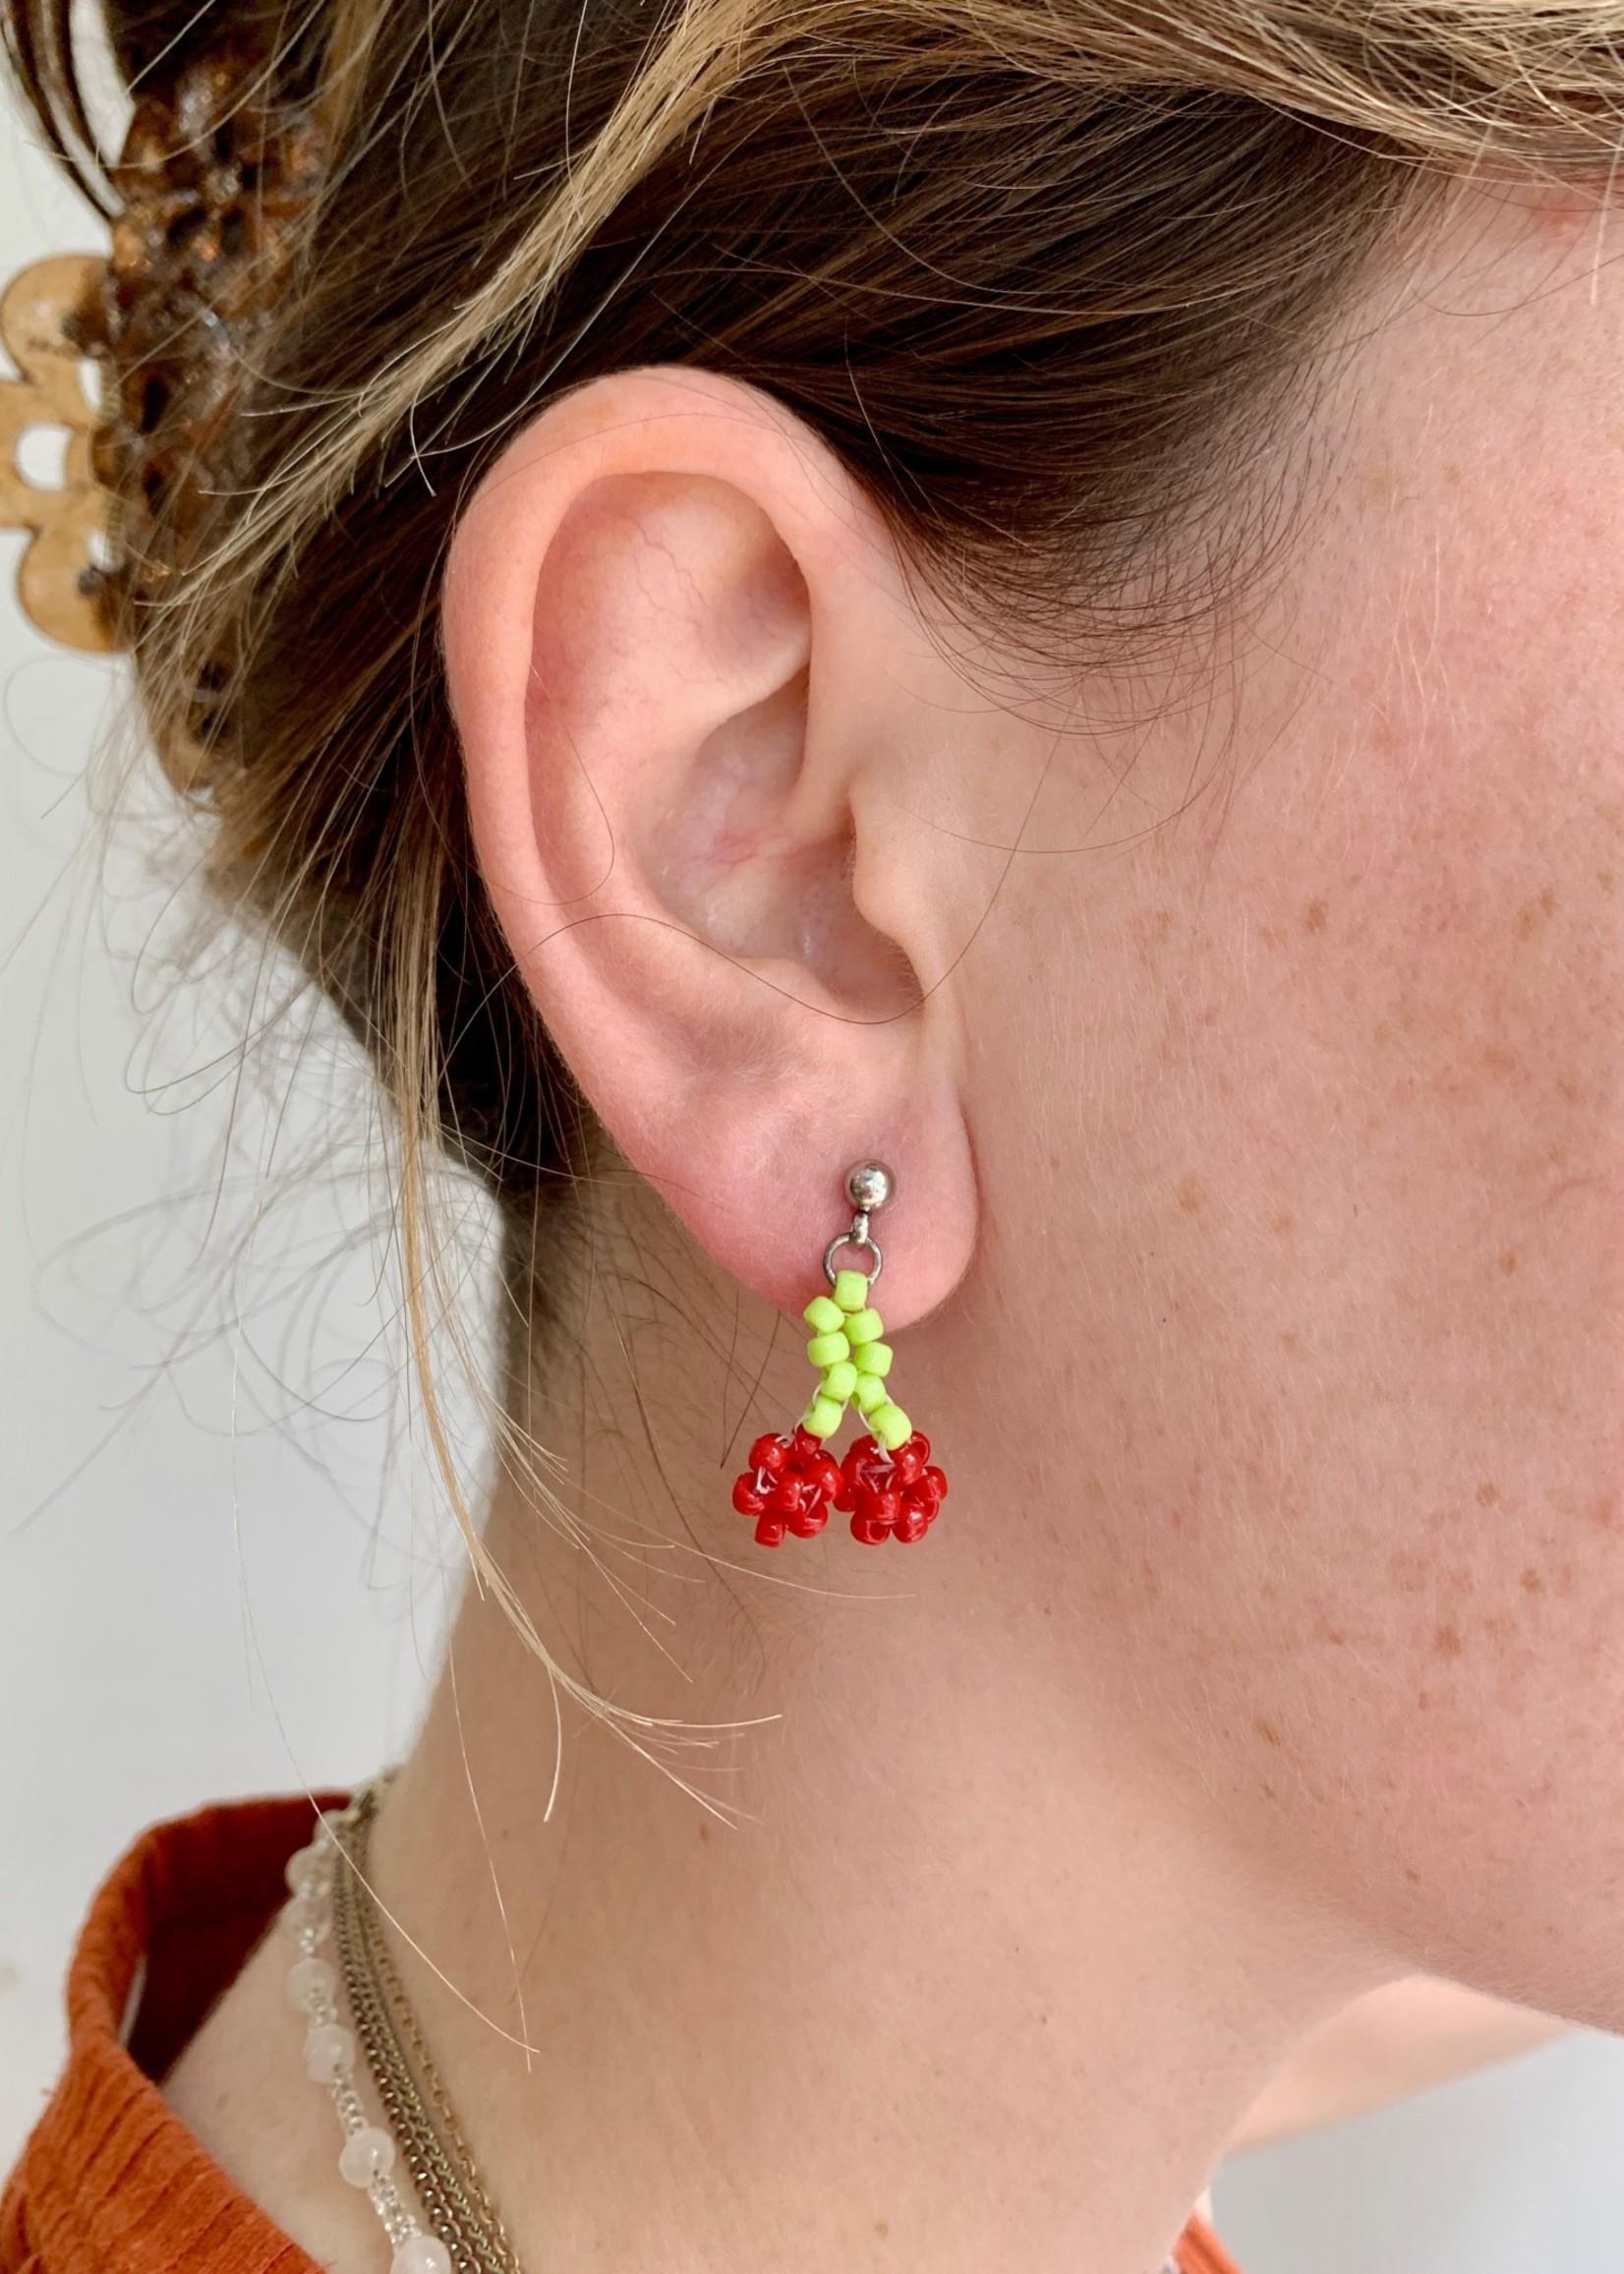 Emri Studio Fruit Stud Earrings by EMRI Studio